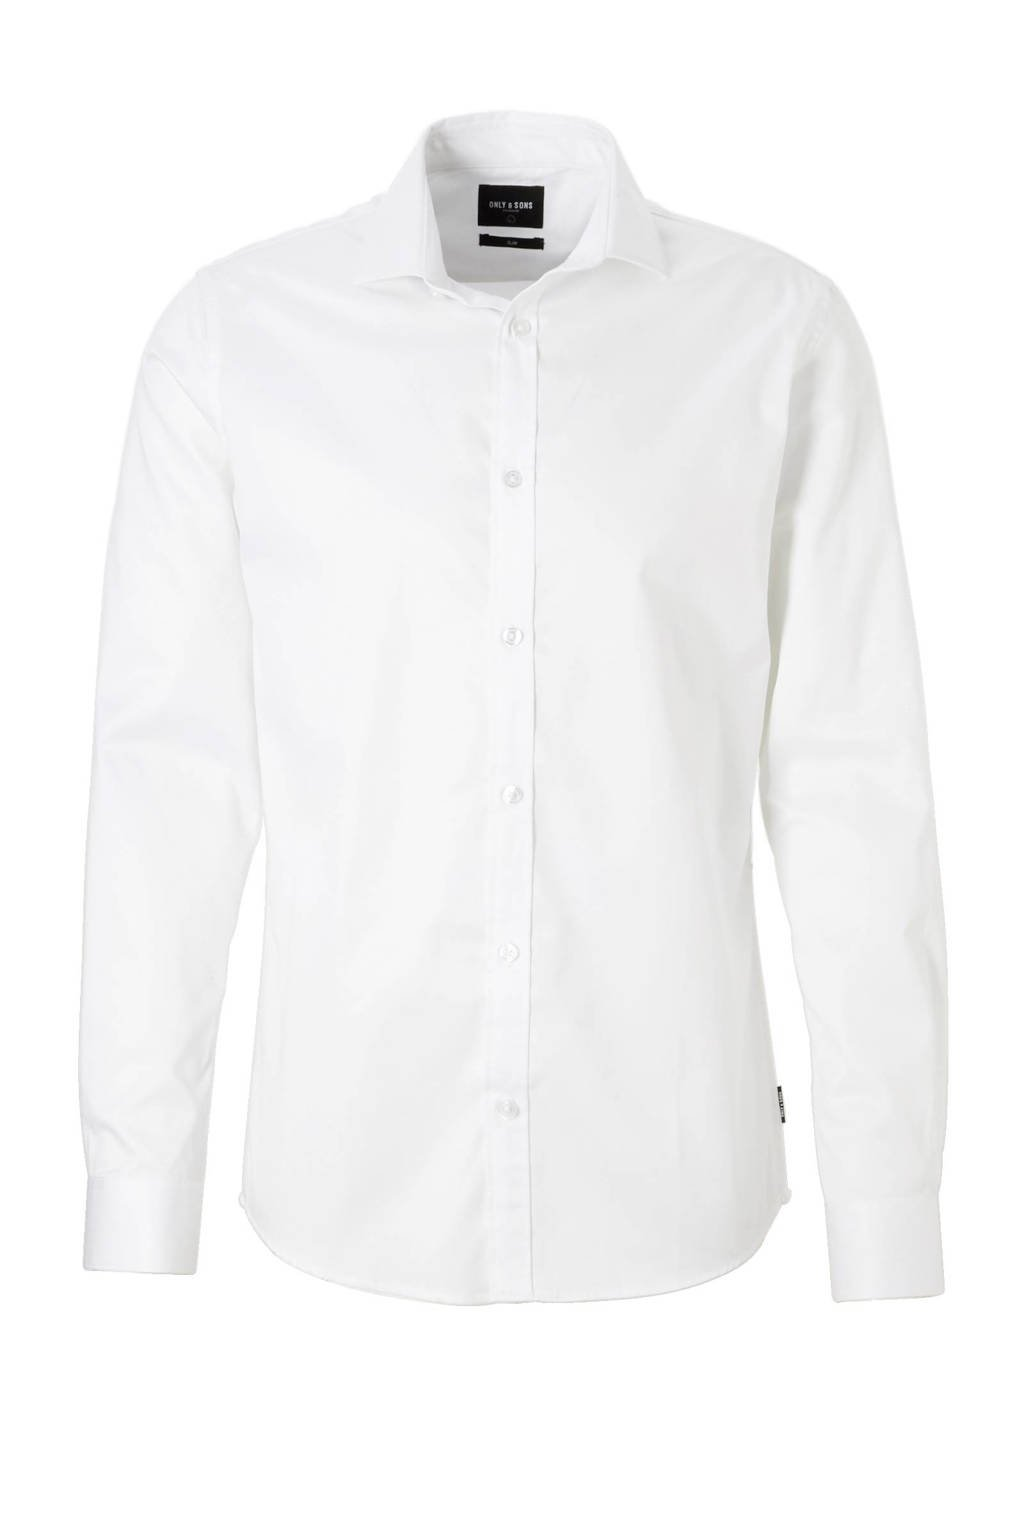 Only & Sons Alves slim fit overhemd, Wit